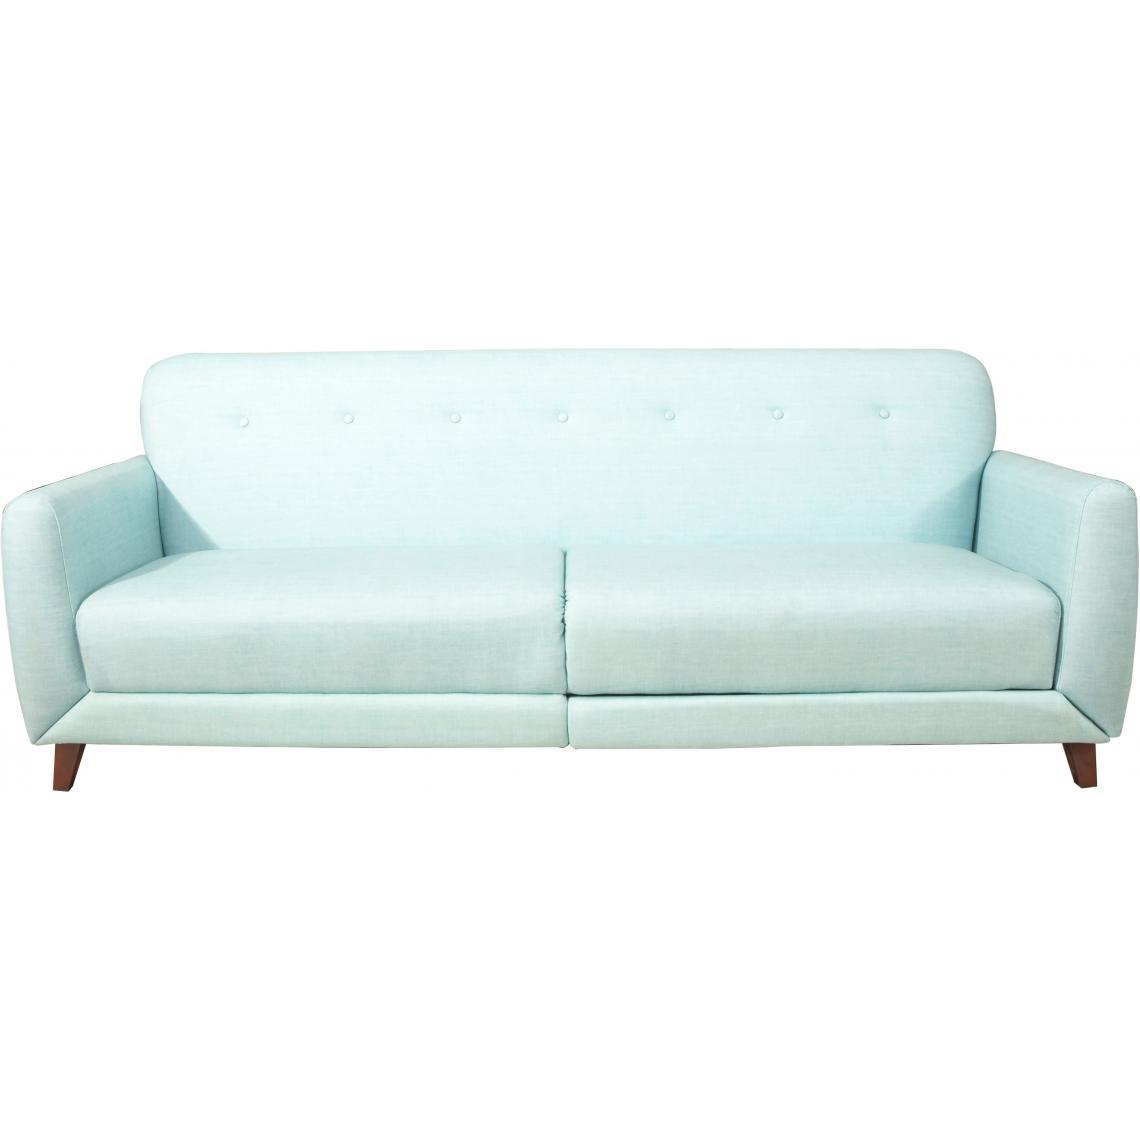 canap convertible clic clac en tissu capitonn lobby 3. Black Bedroom Furniture Sets. Home Design Ideas